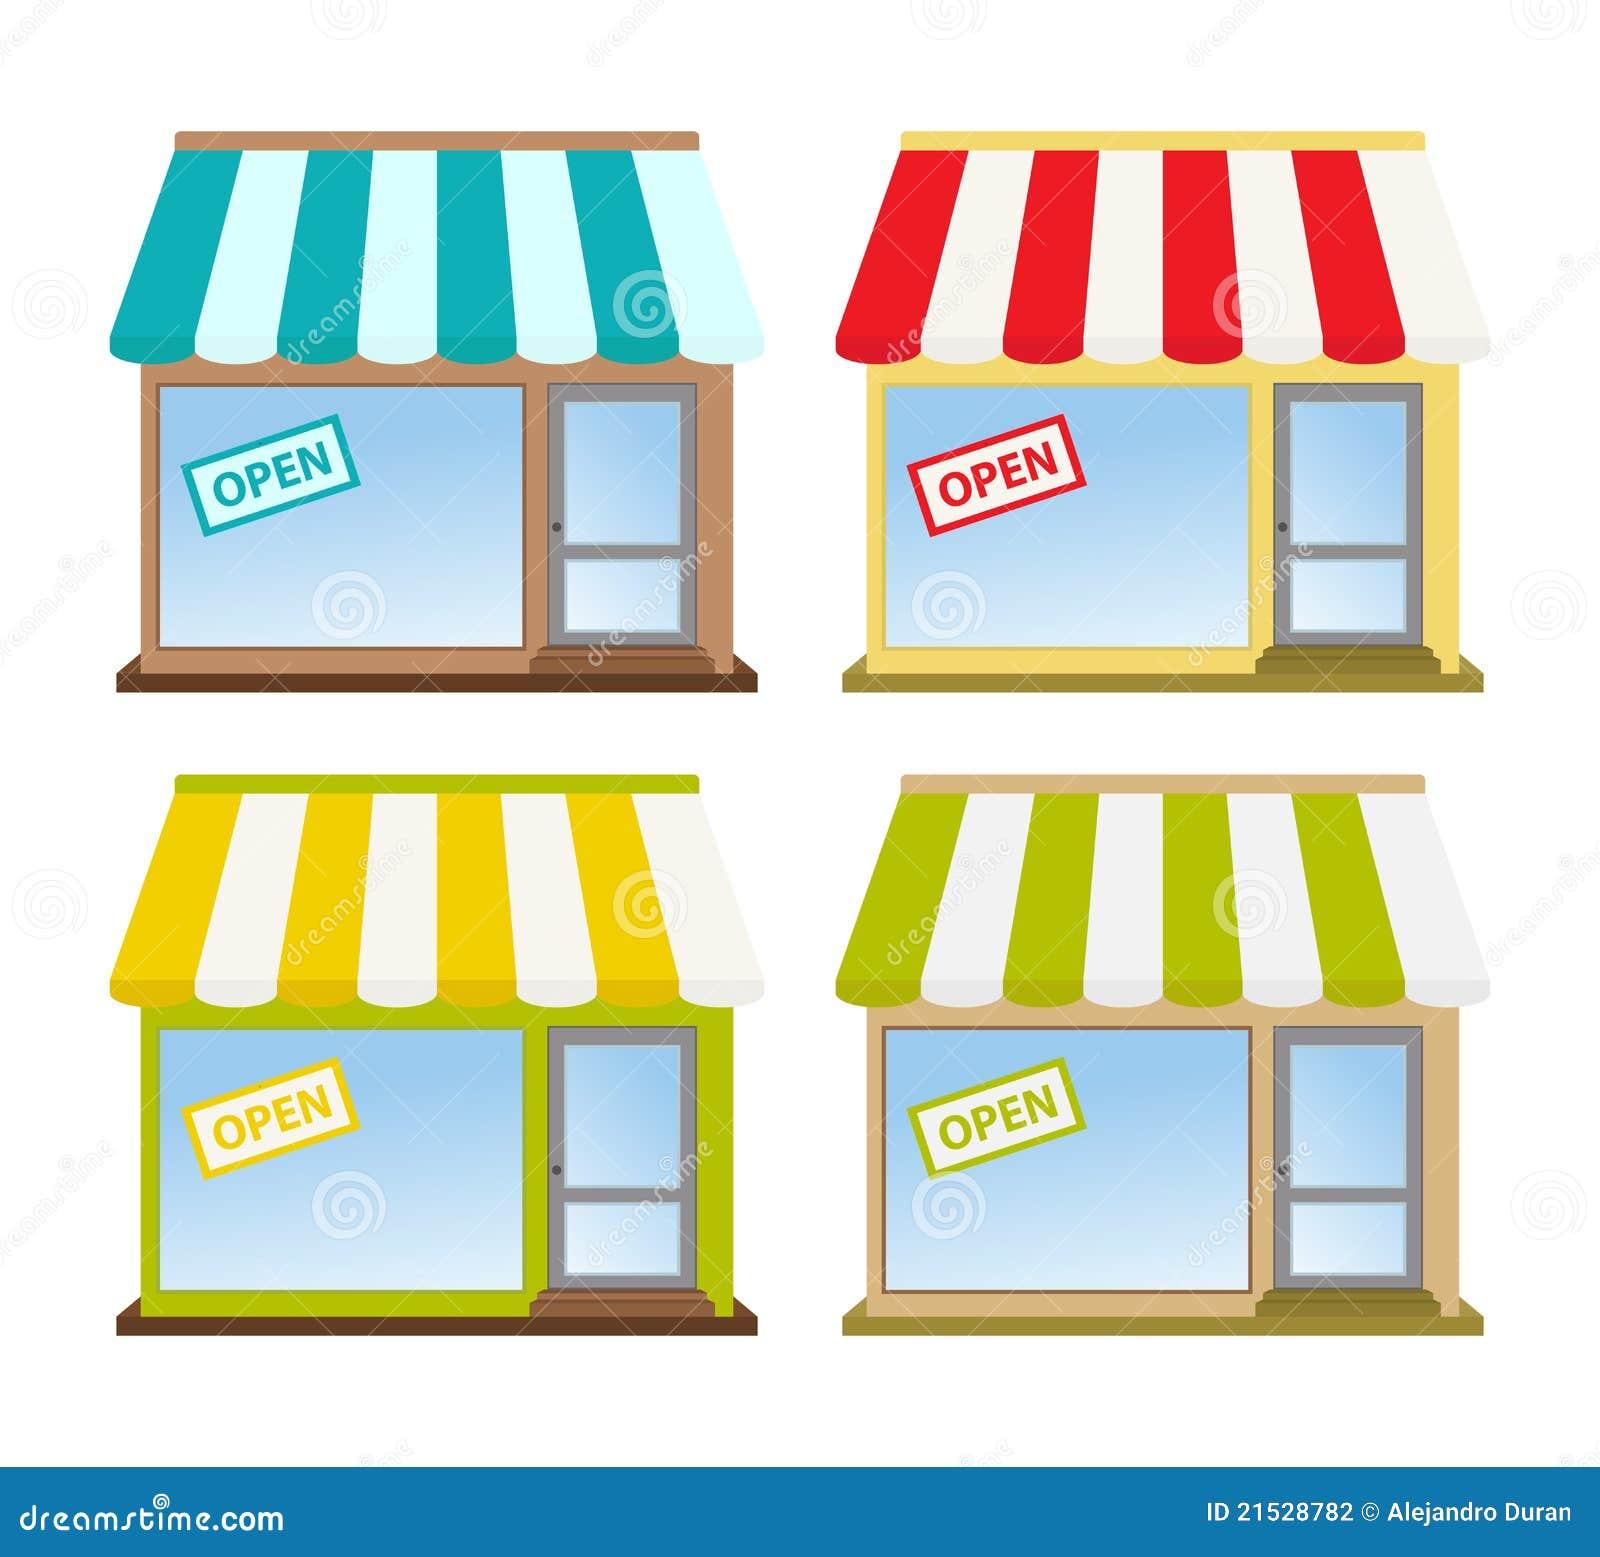 retail store clip art free - photo #44